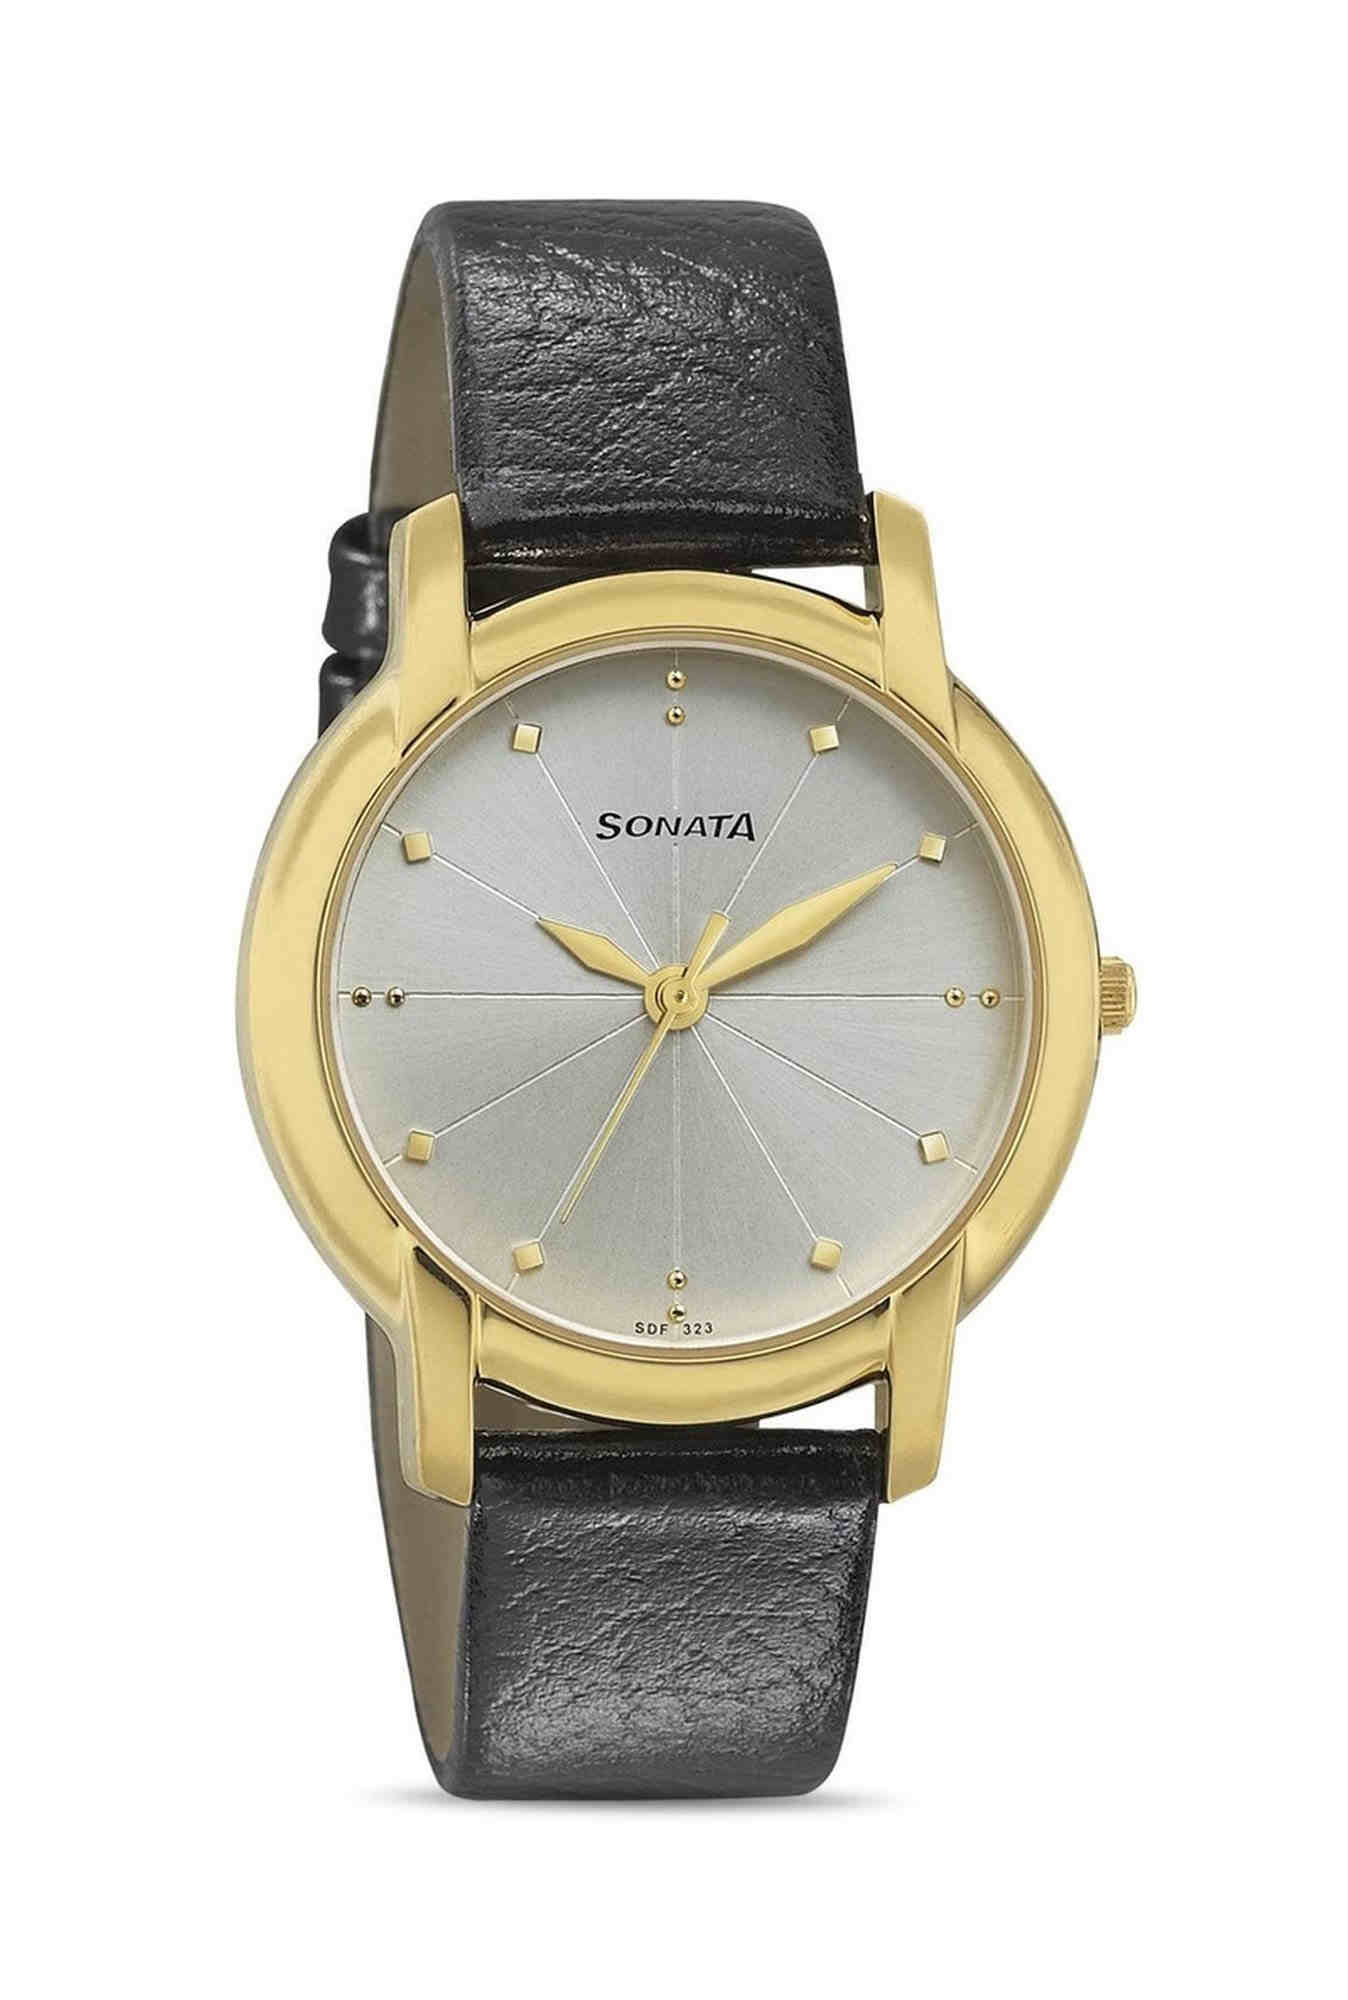 Sonata 7954YL07 Professional Analog White Dial Men's Watch